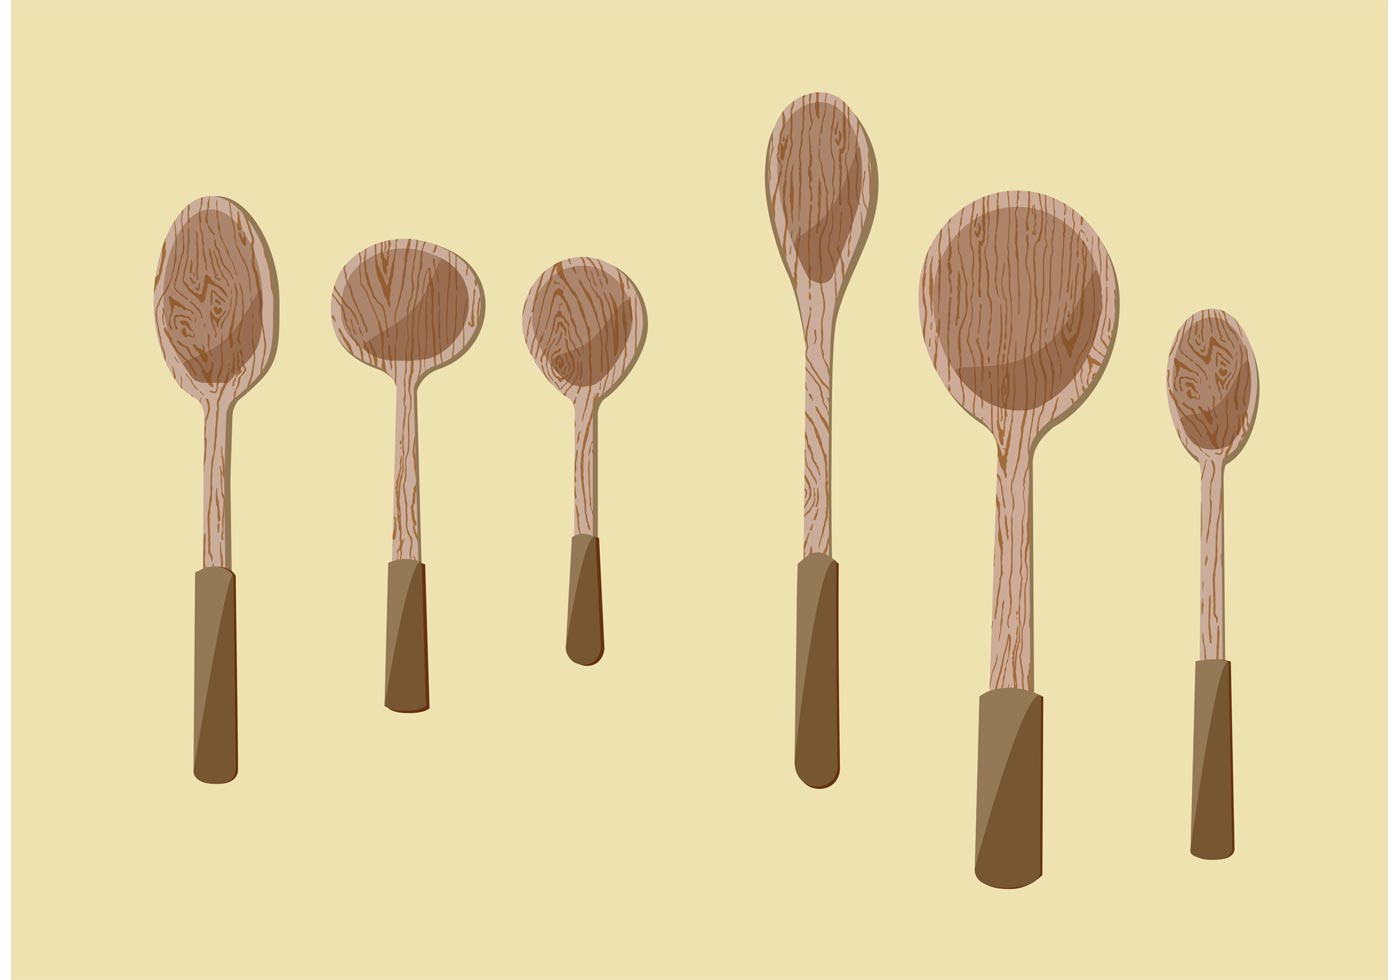 Wooden Spoon Vector Illustrations